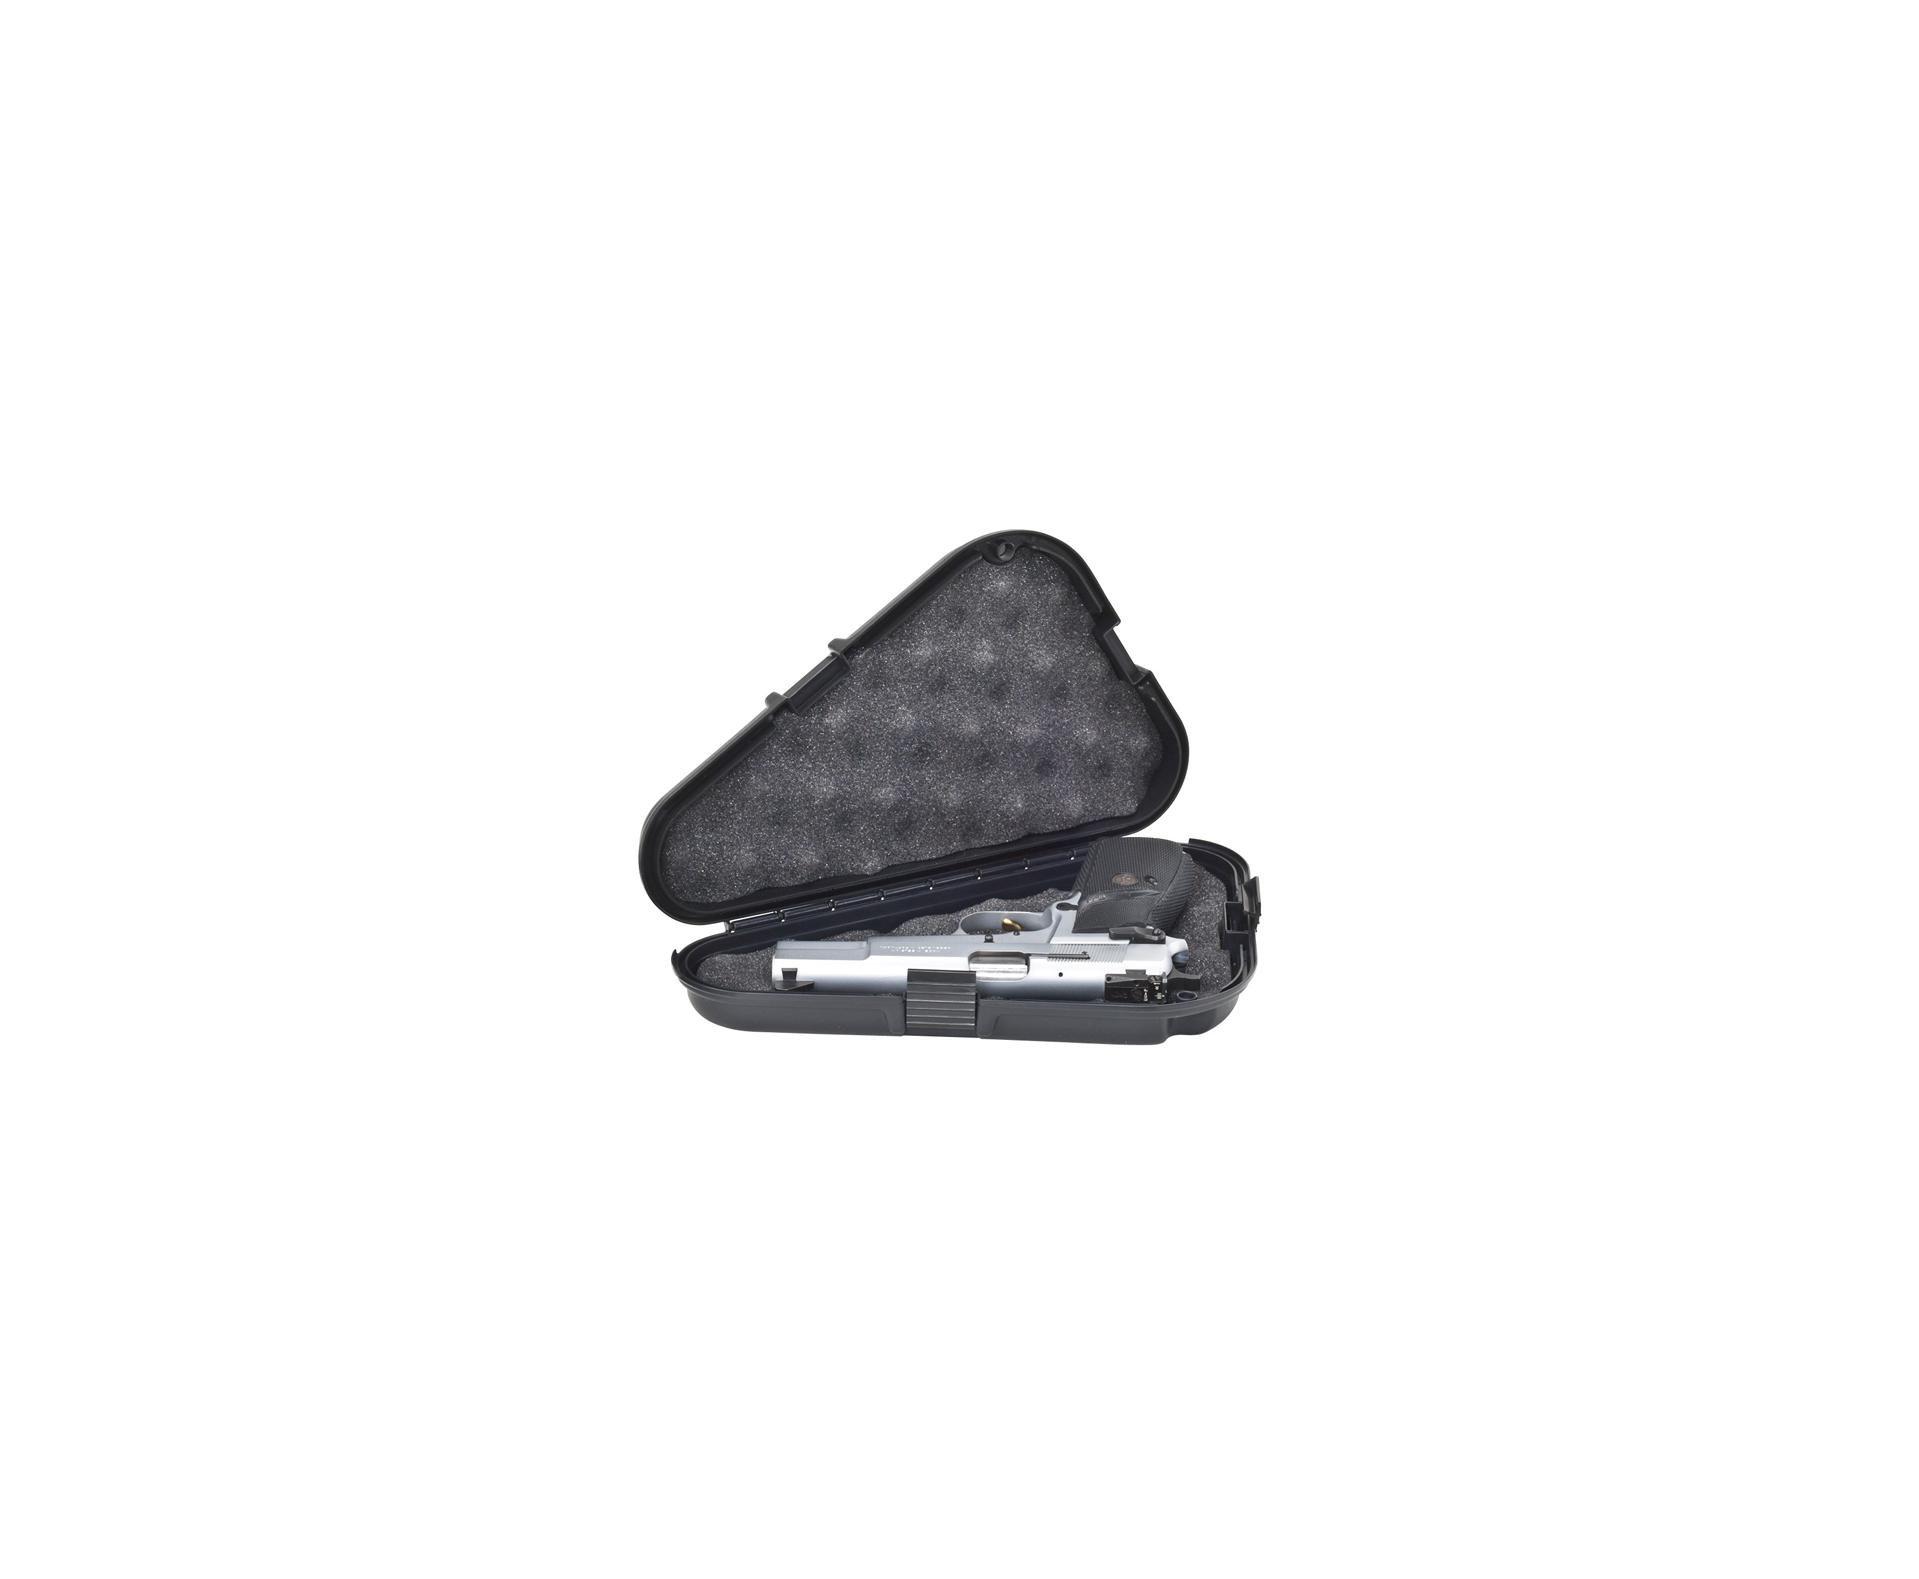 Caixa (case) Para Arma Curta - Gun Guard 1423-00 - Plano